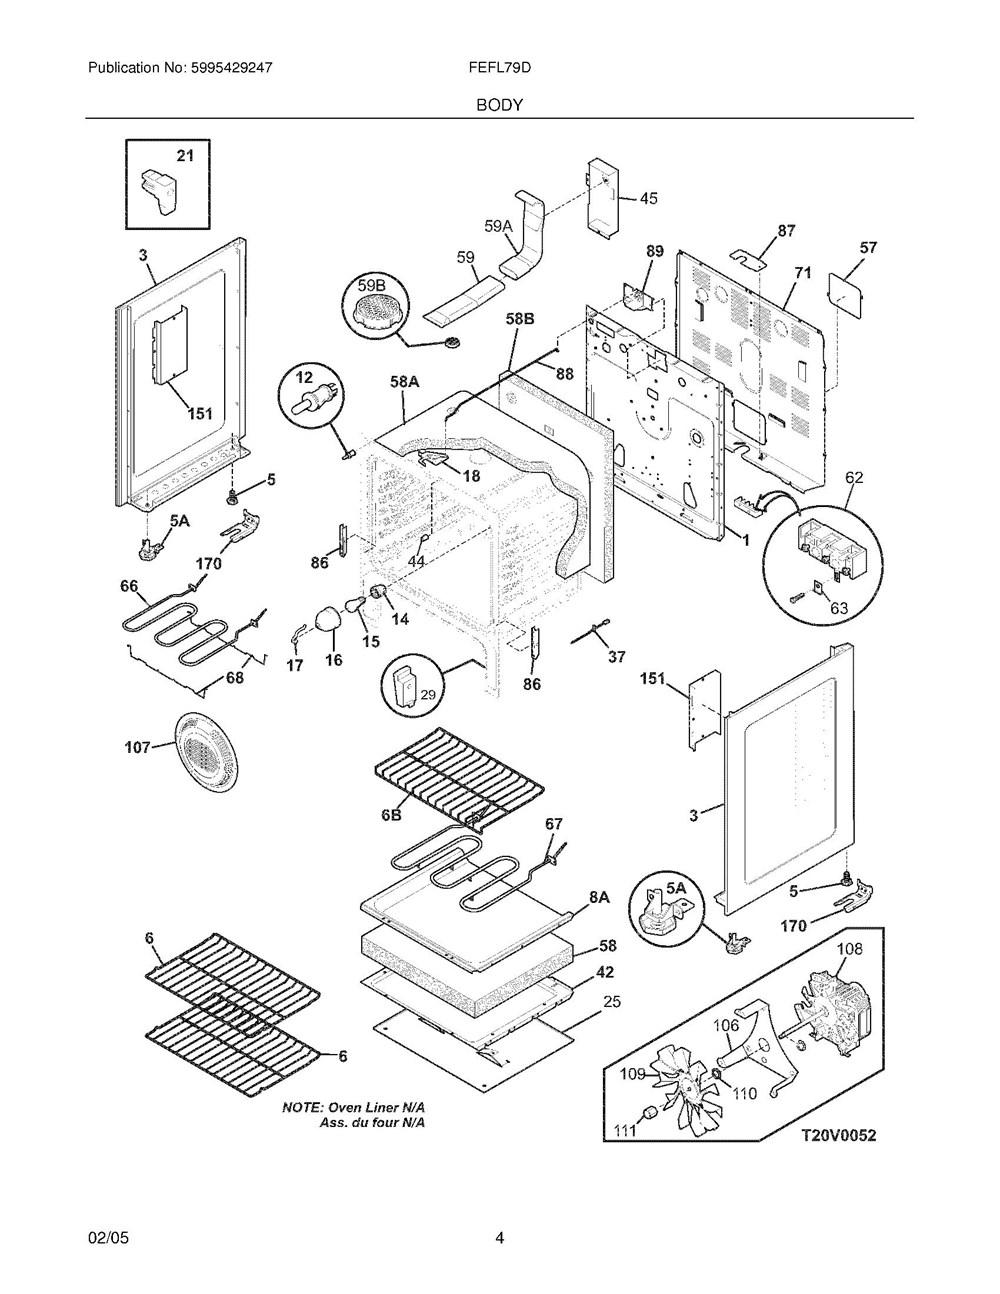 Fefl79dbd Frigidaire Company Backguard 05body 07top Drawer 09door 01cover 10wiring Diagram